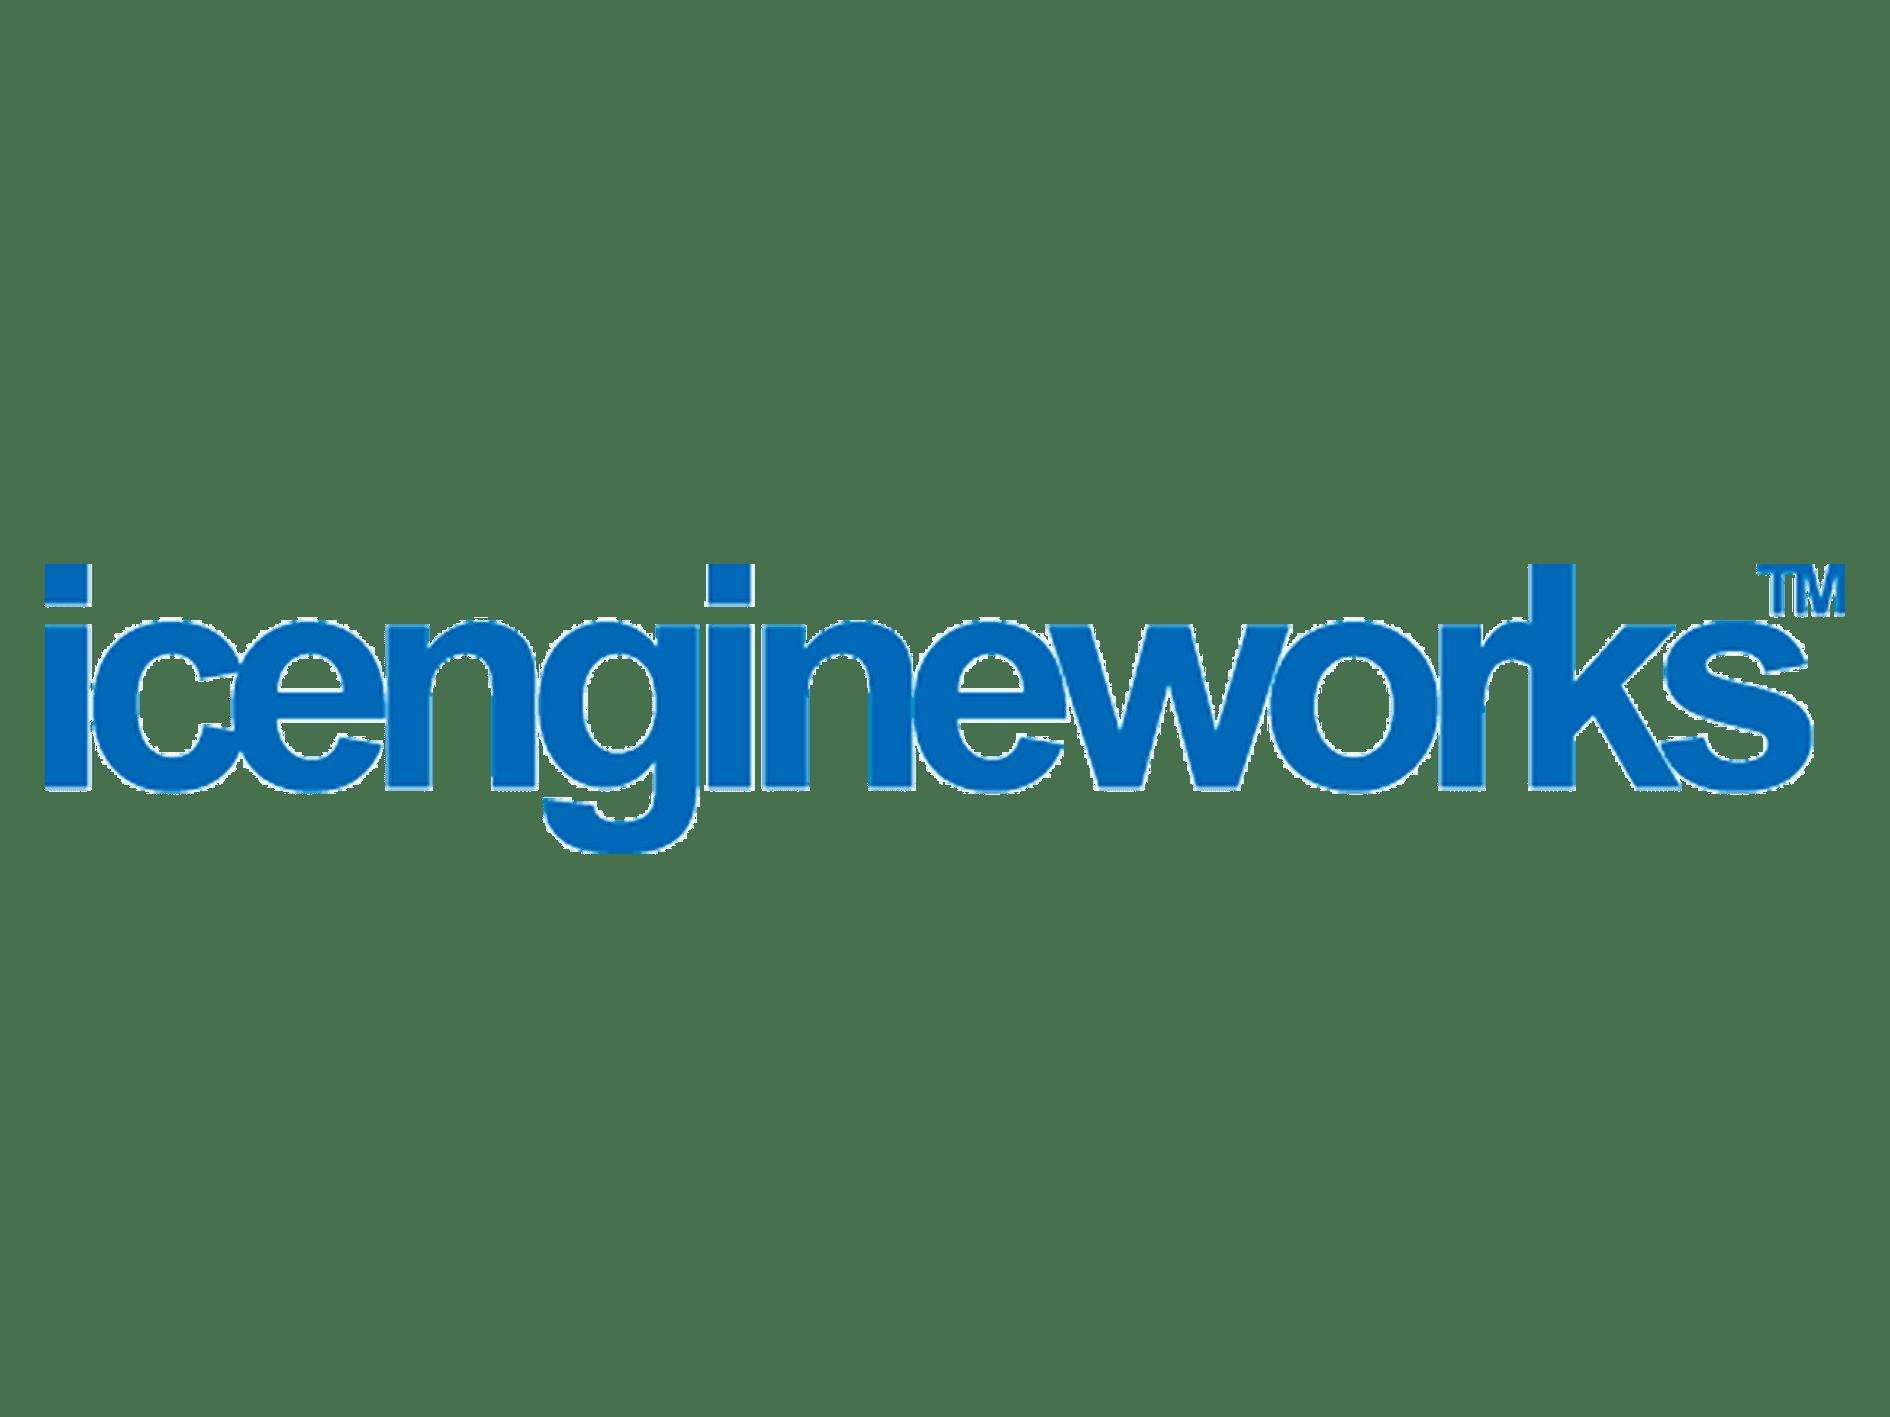 Icenigneworks